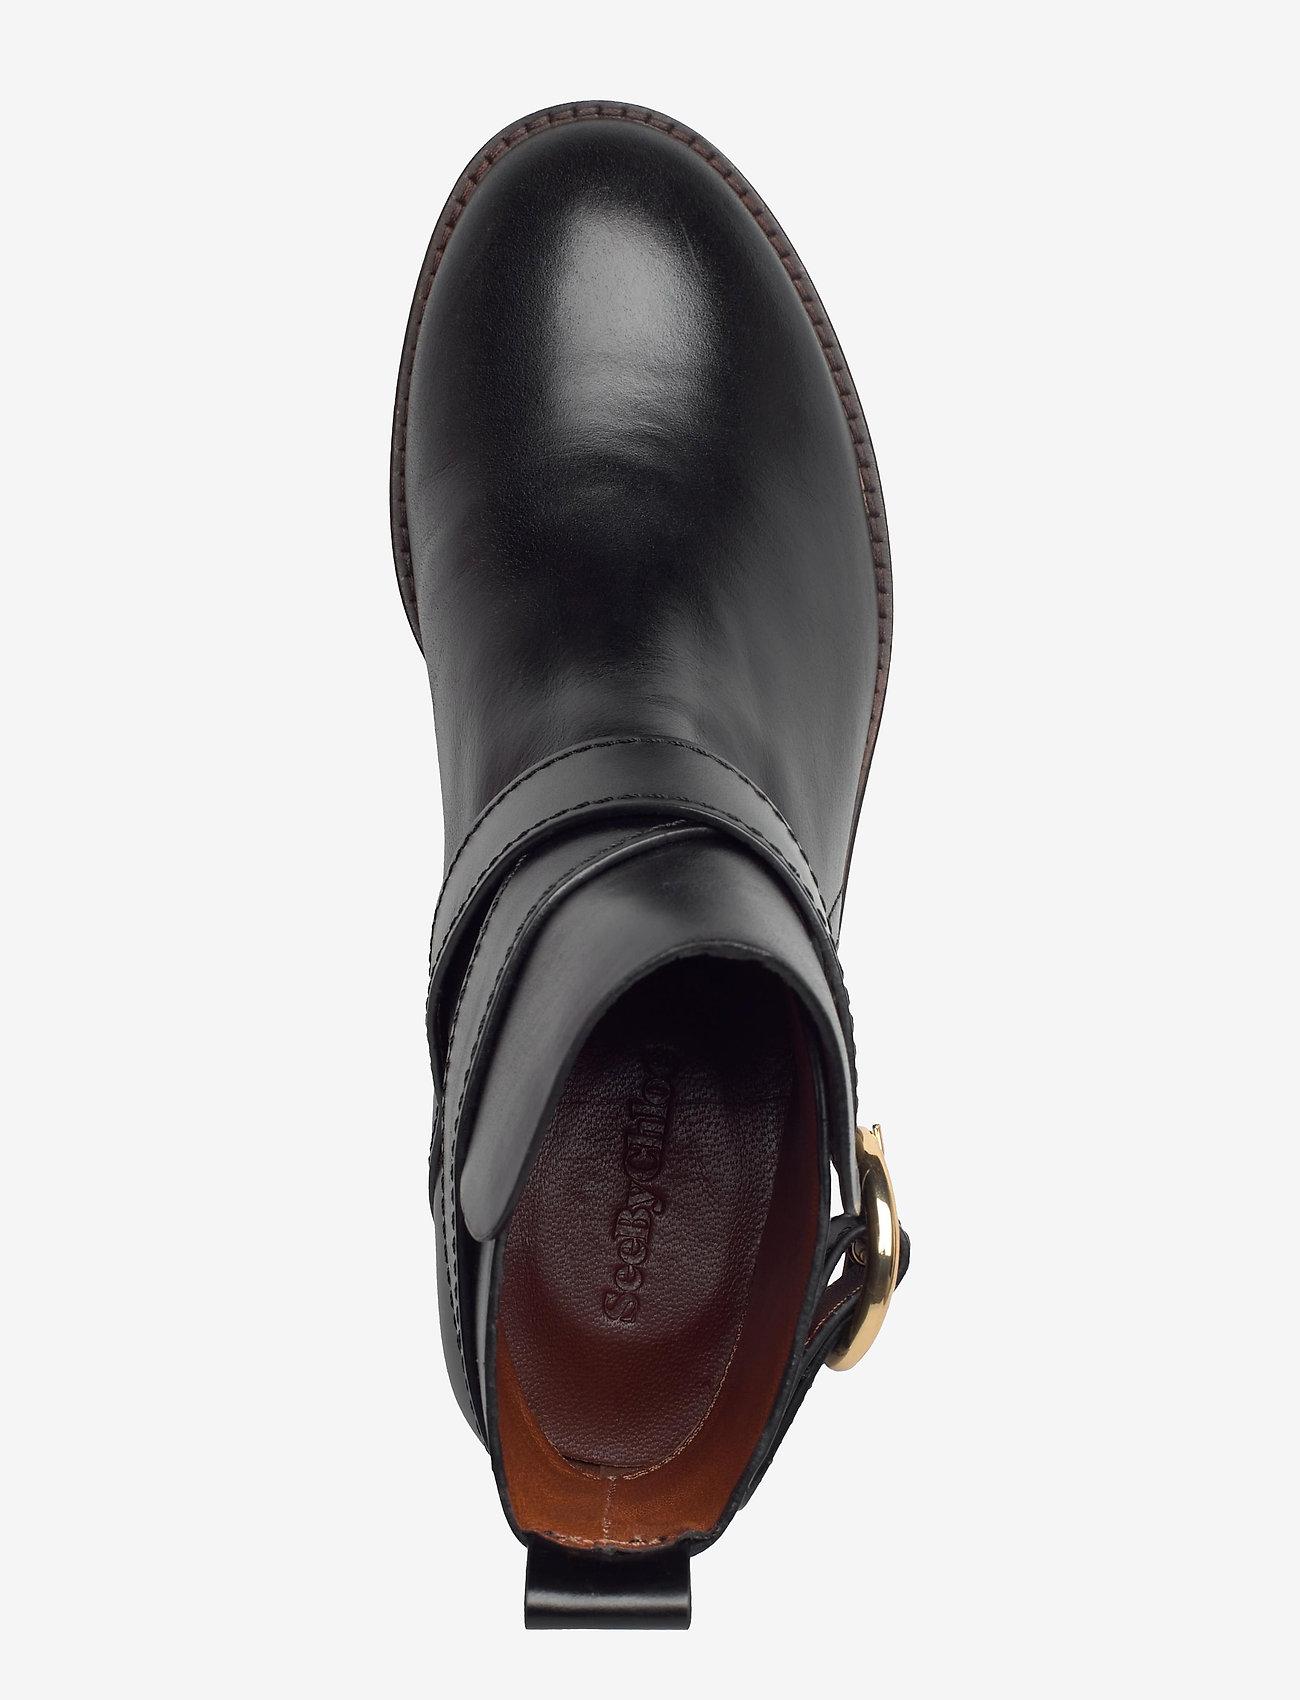 See by Chloé - FLAT ANKLE BOOTS - flate ankelstøvletter - black - 3